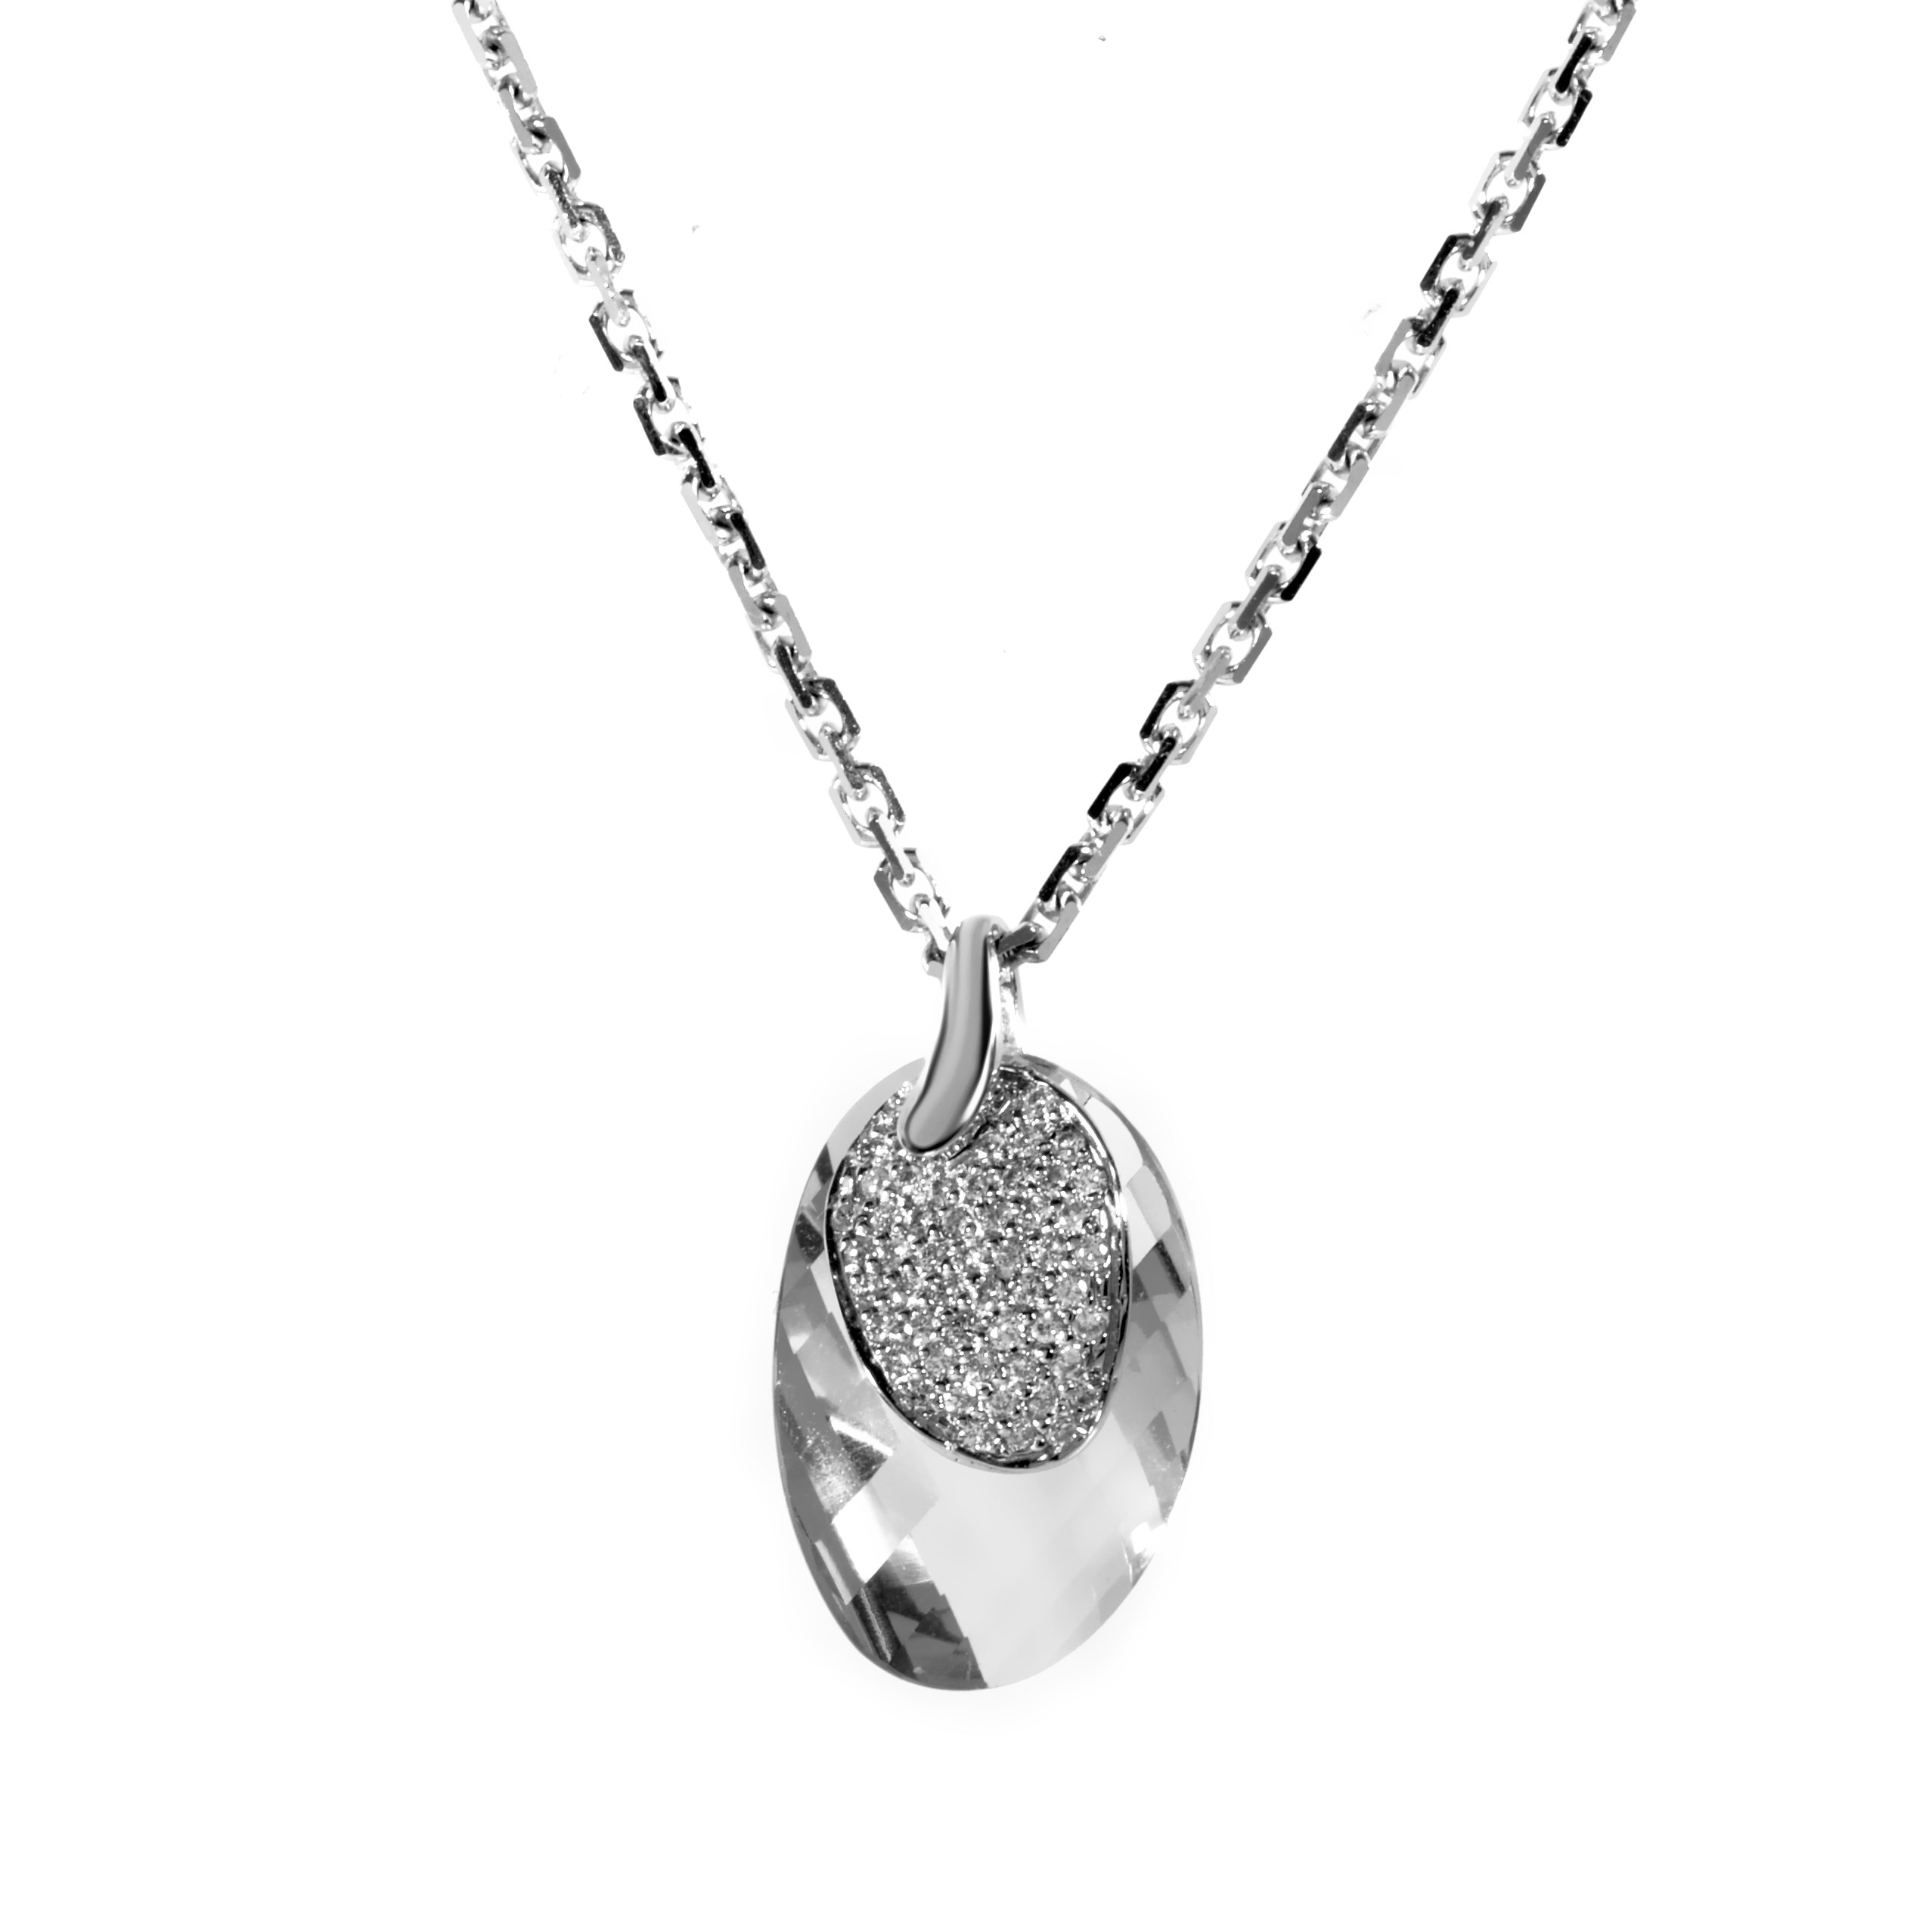 18K White Gold Diamond & Green Amethyst Gemstone Pendant Necklace PD8-021402WGA